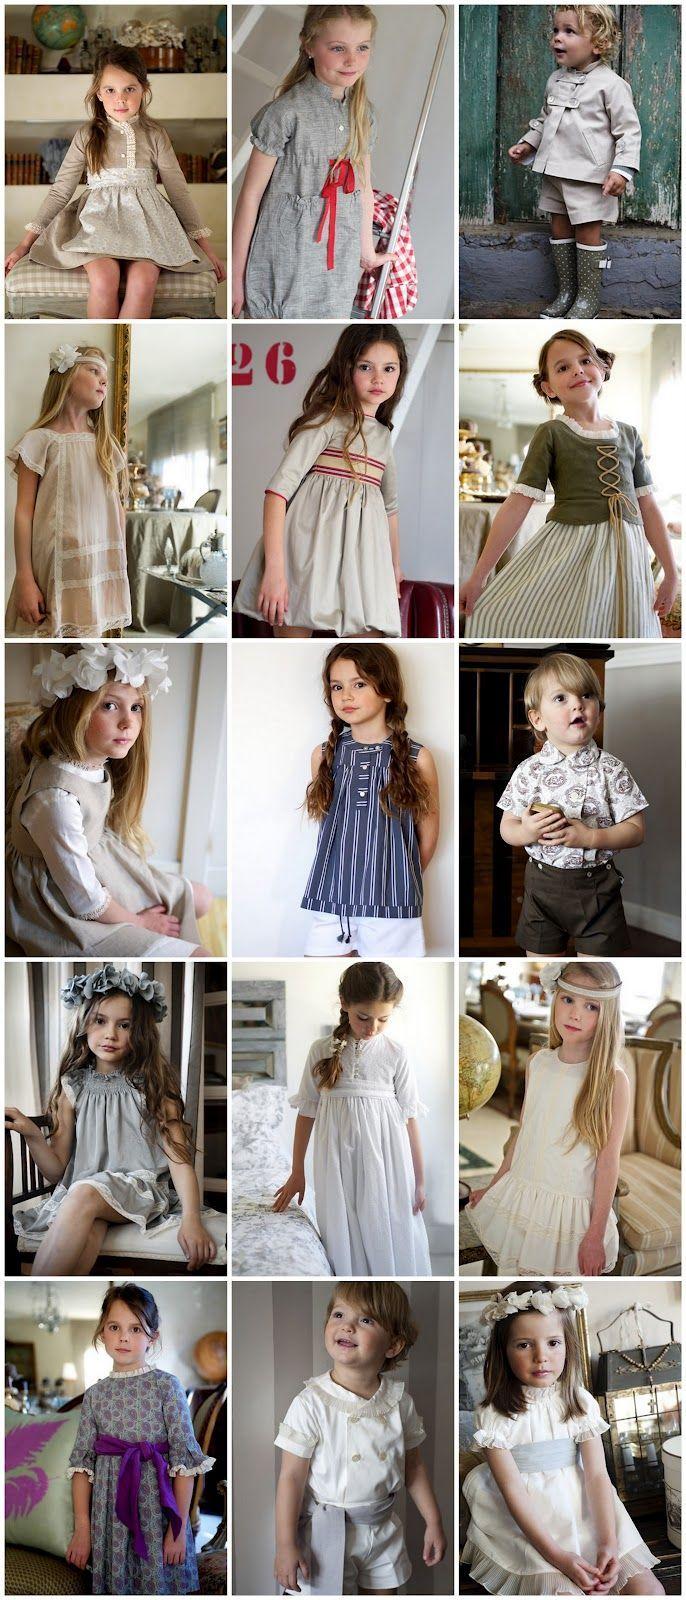 The look is vintage, handmade, lineny.